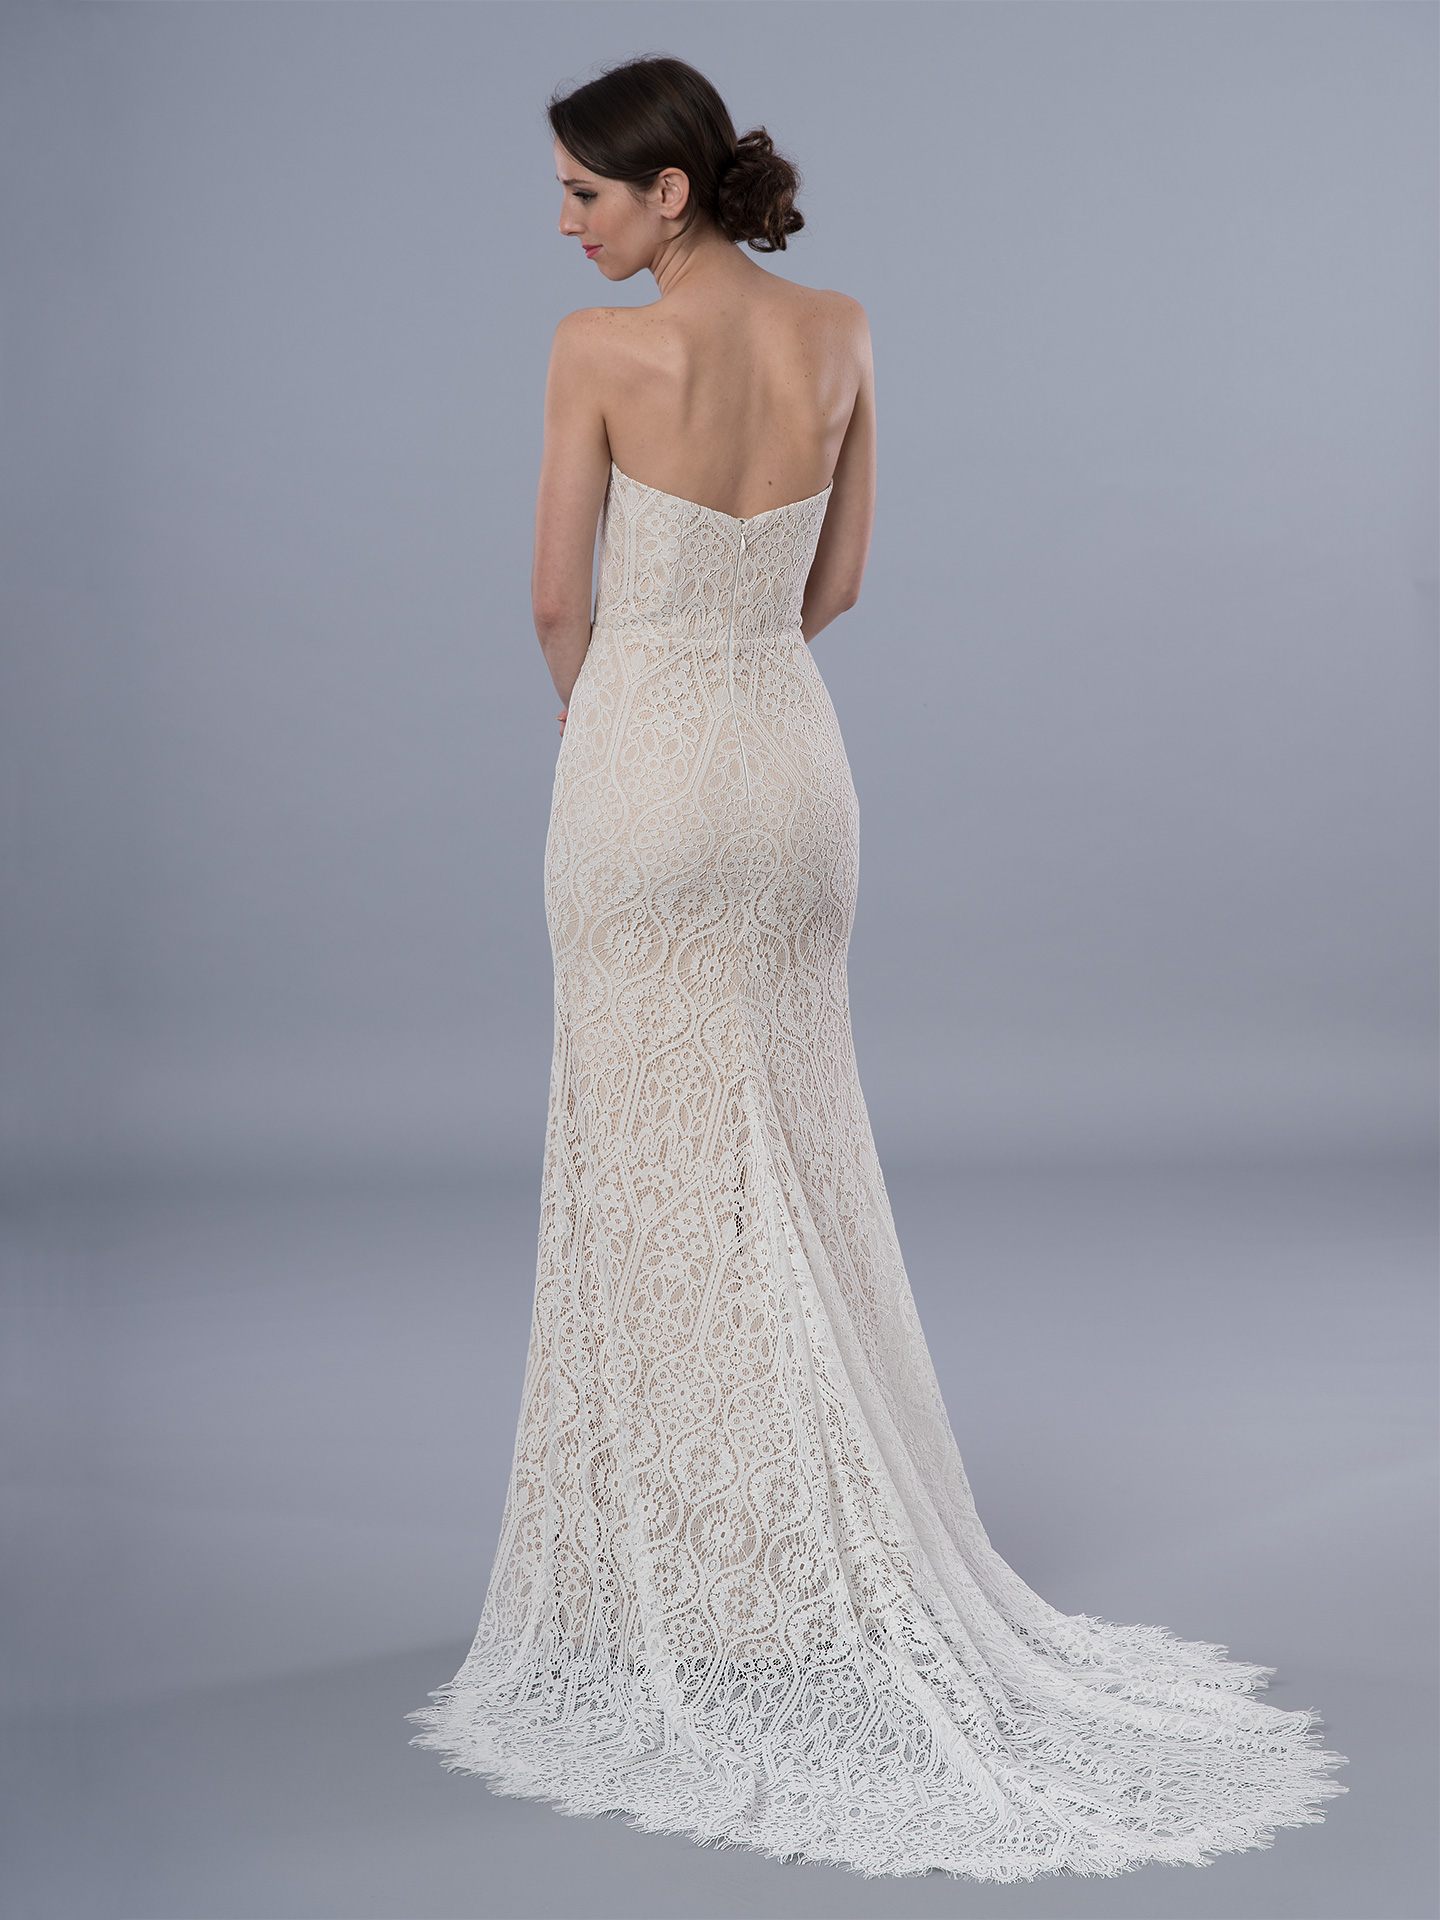 Boho wedding dress strapless 4072